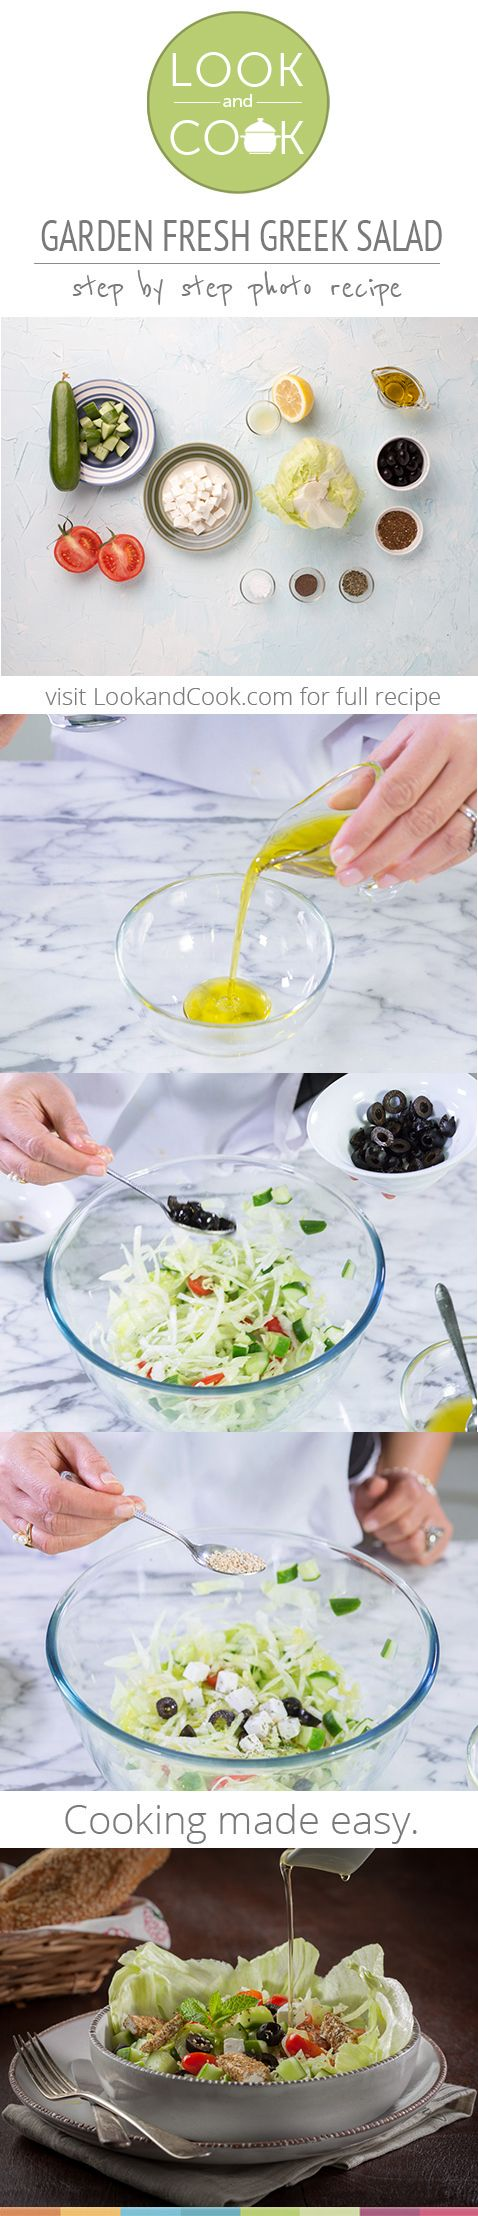 GARDEN FRESH GREEK SALAD RECIPE GARDEN FRESH GREEK SALAD RECIPE (LC14205) : This salad is a quick and easy to make healthy salad. The Zaatar and Feta cheese give it a good Mediterranean flavor.